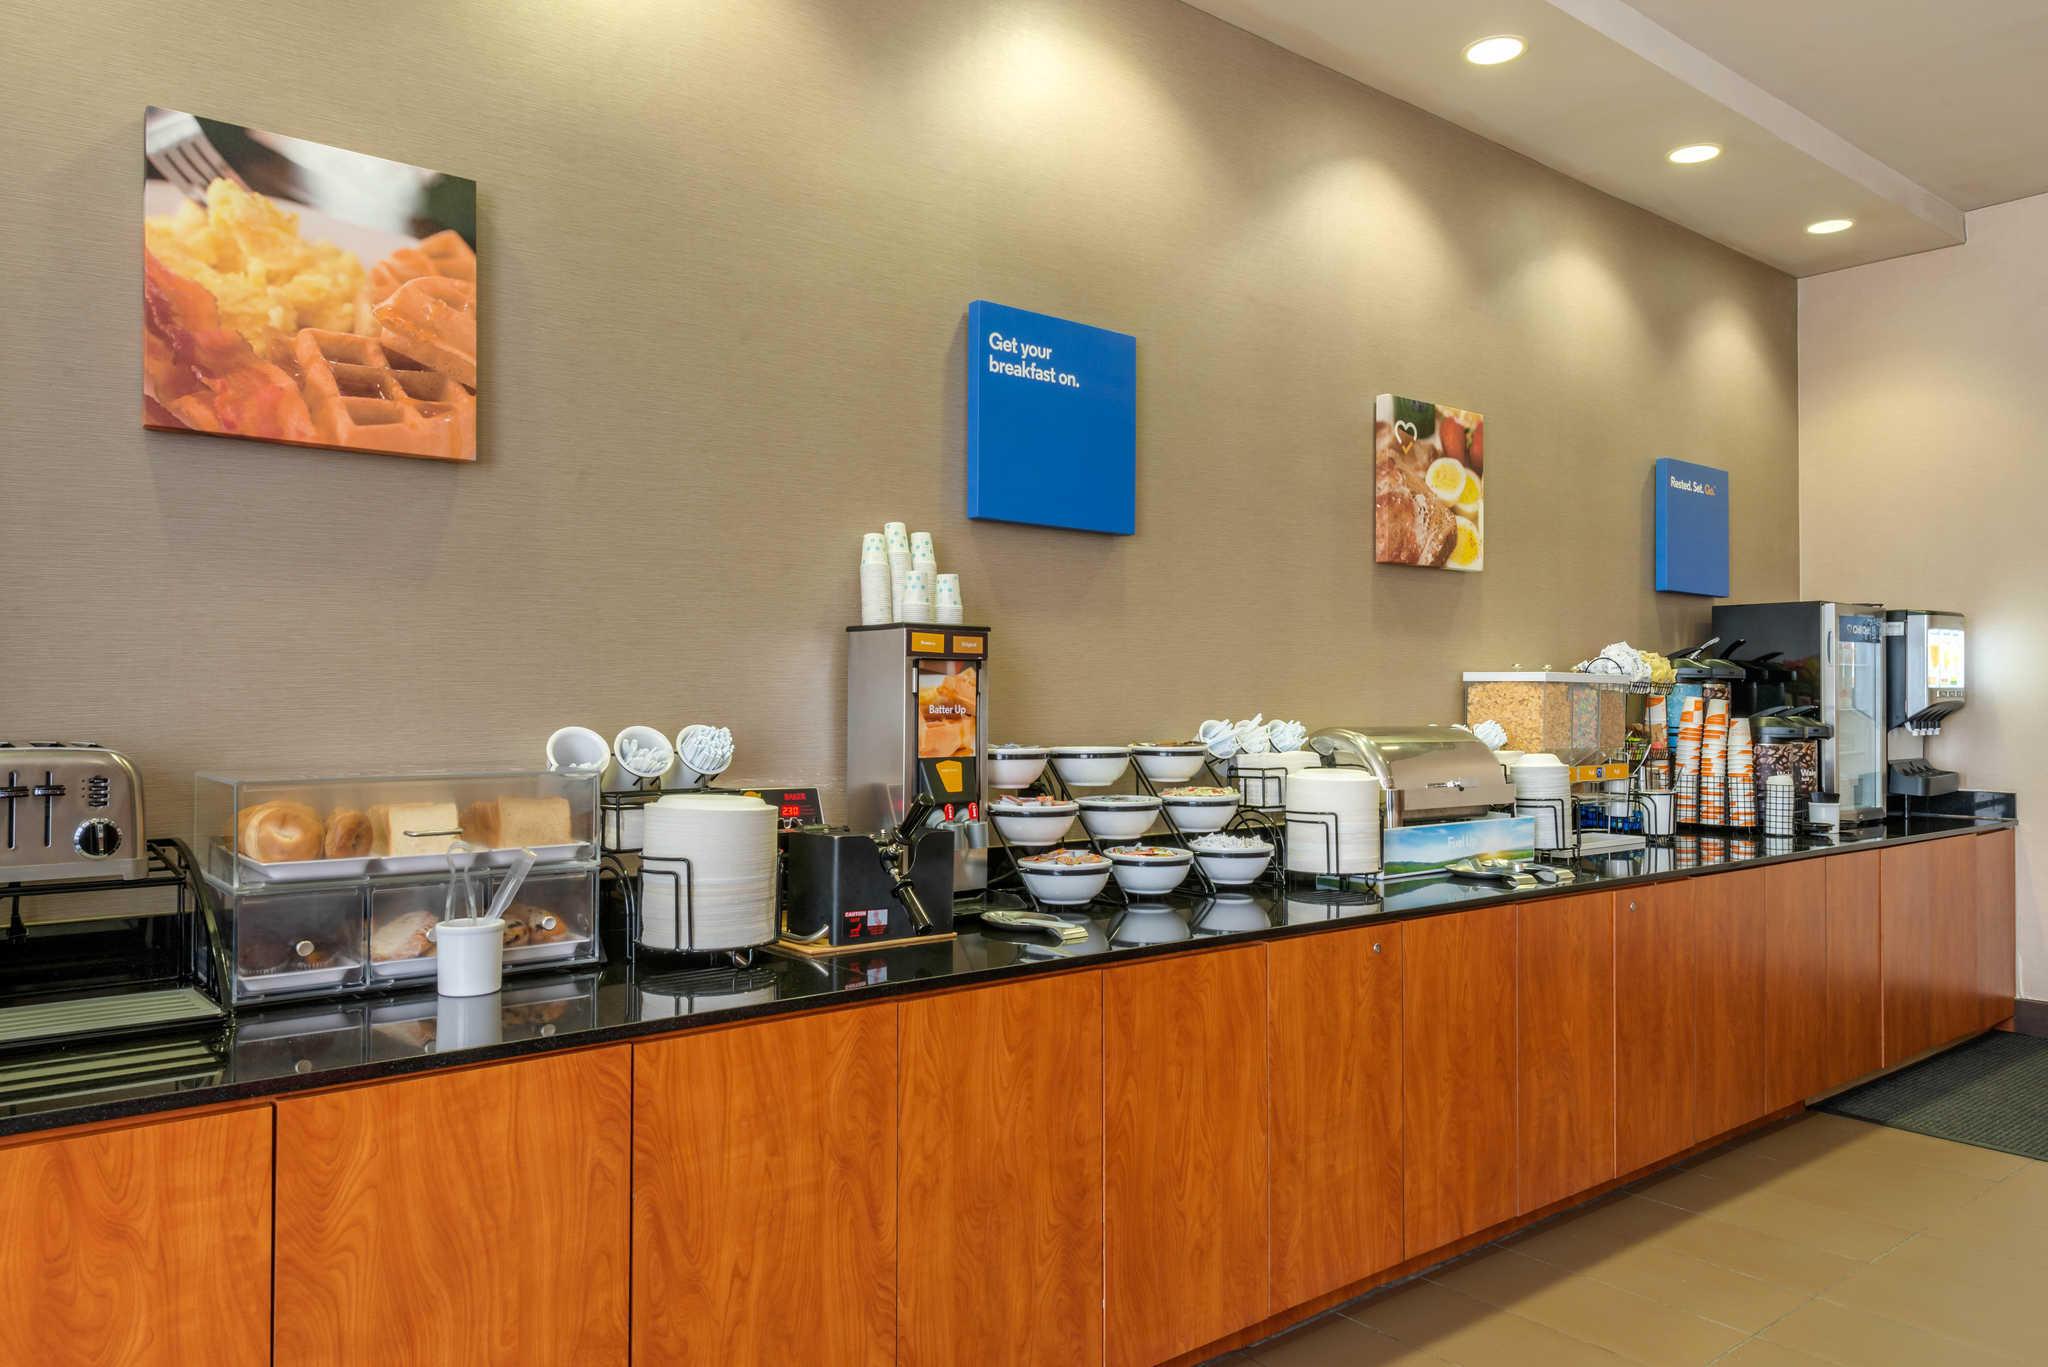 Comfort Inn DFW Airport North image 34